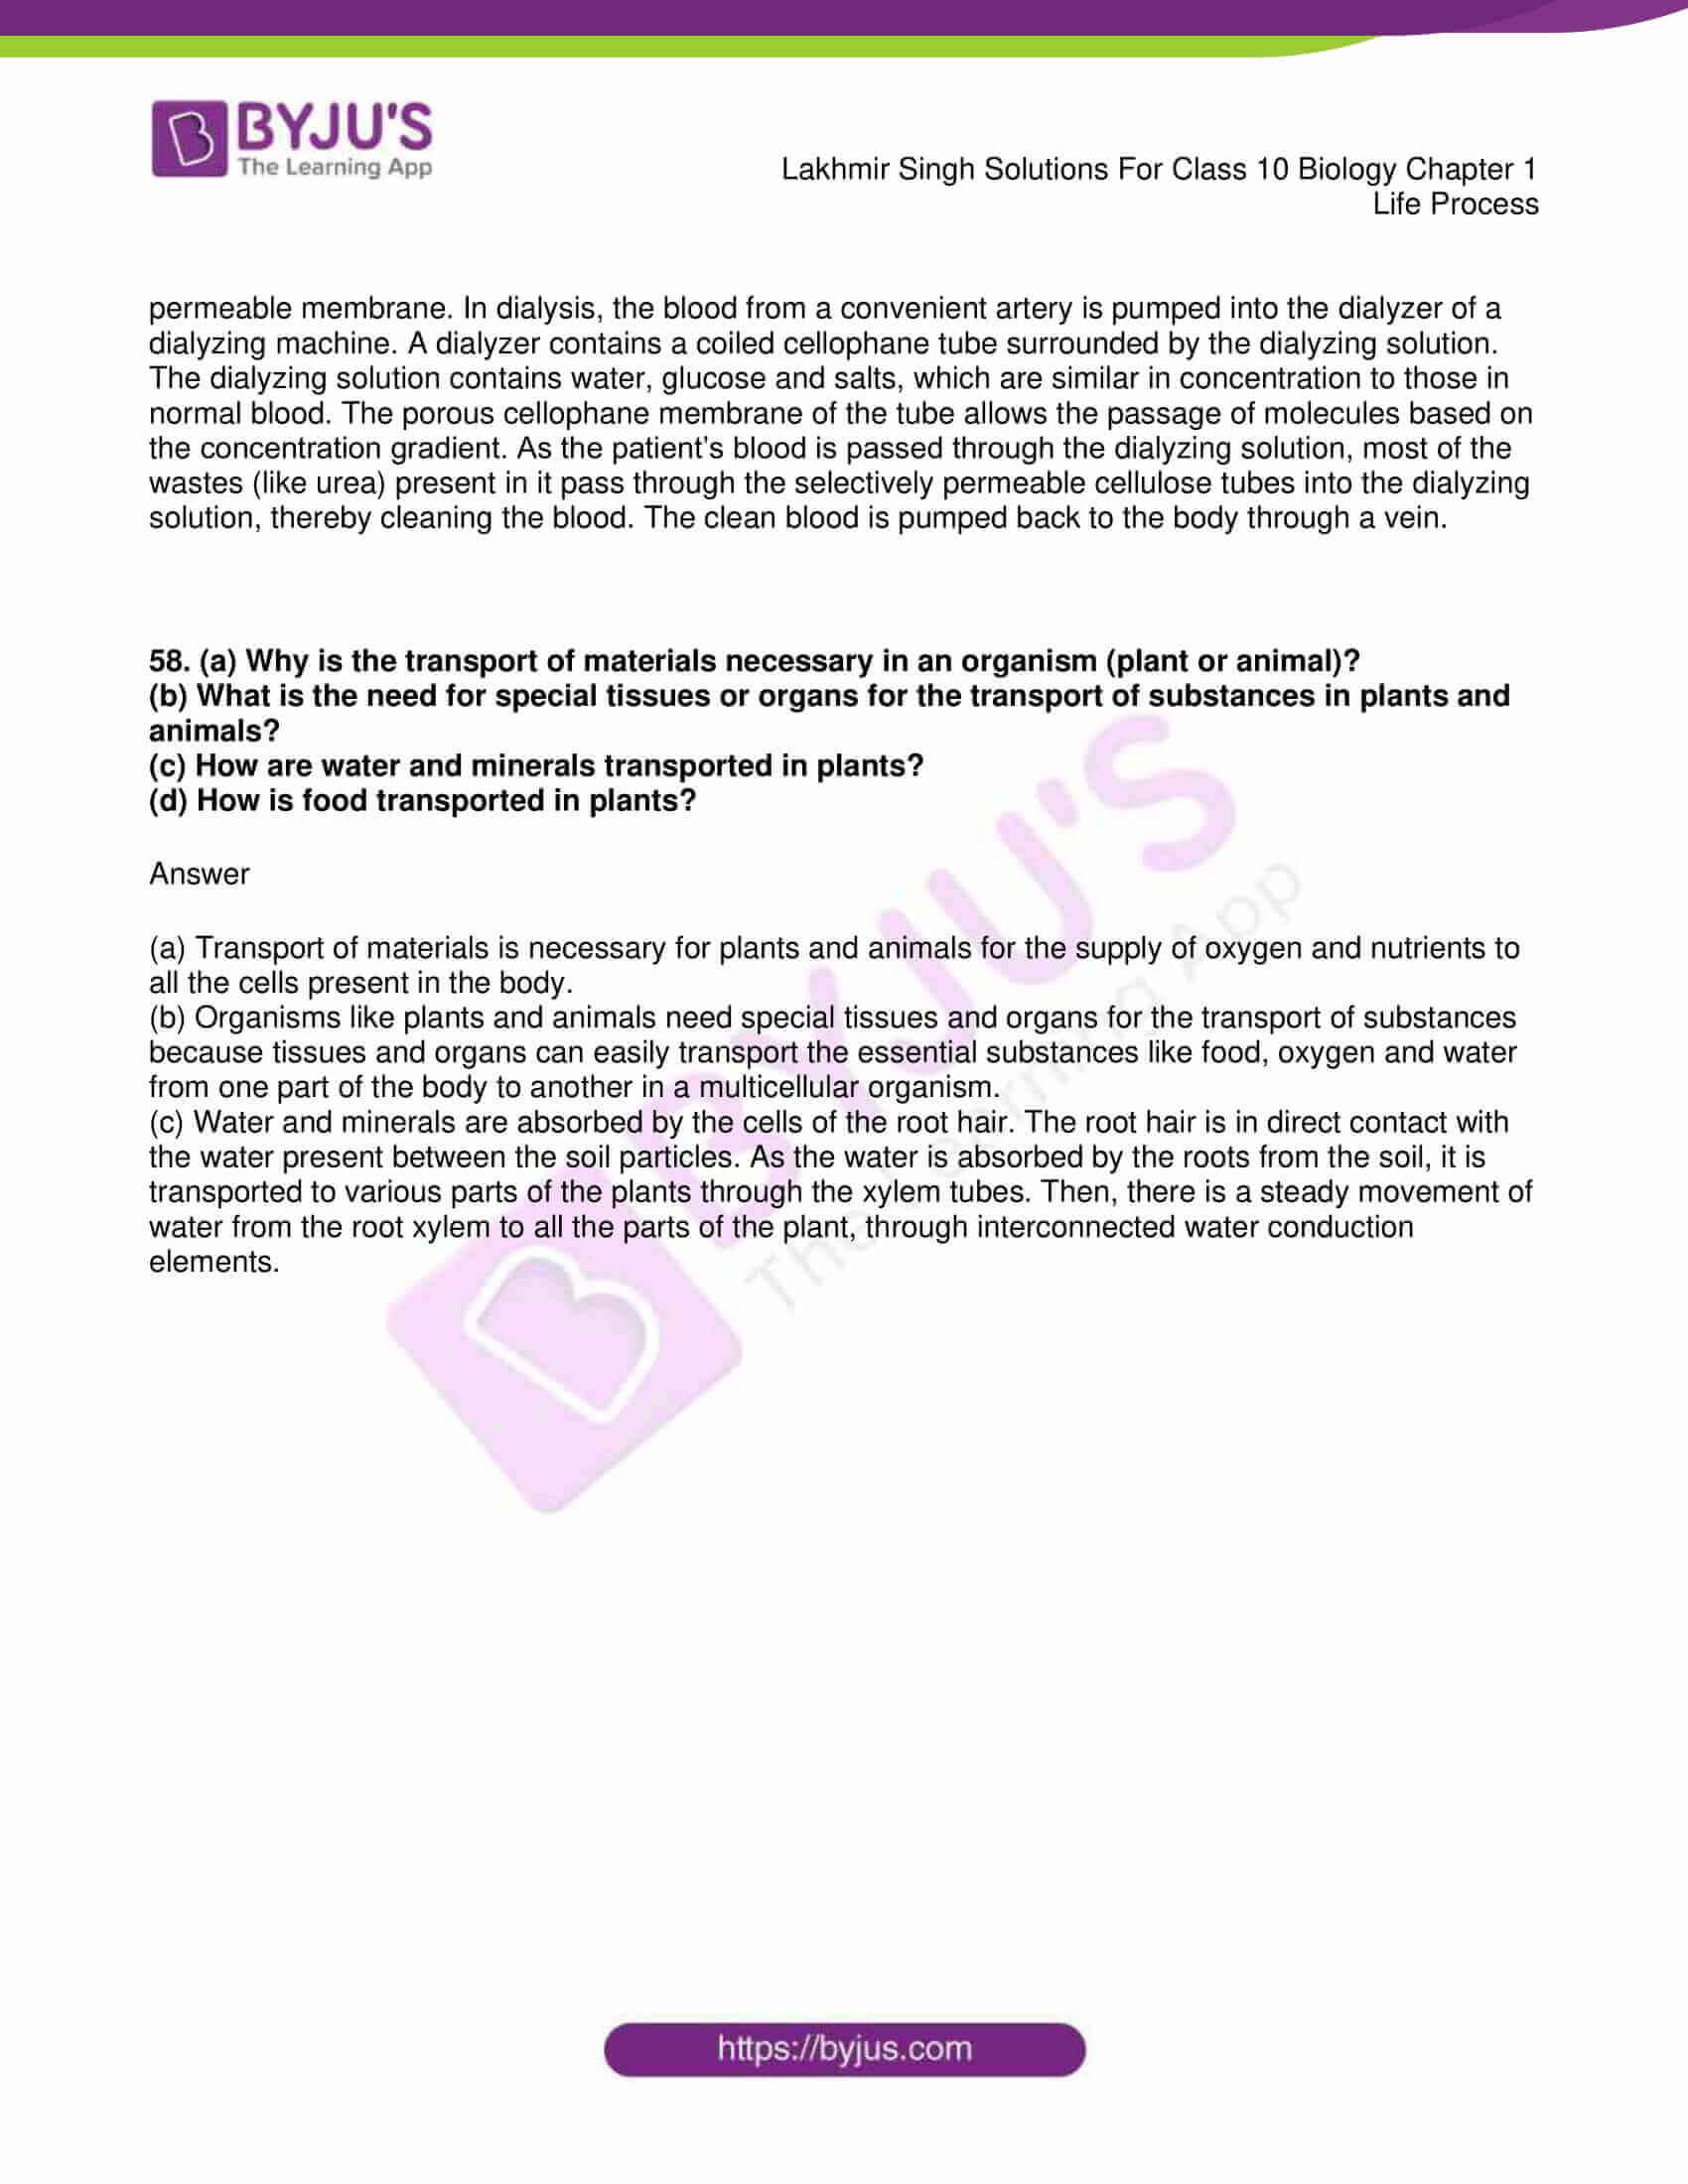 lakhmir singh sol class 10 biology chapter 1 79